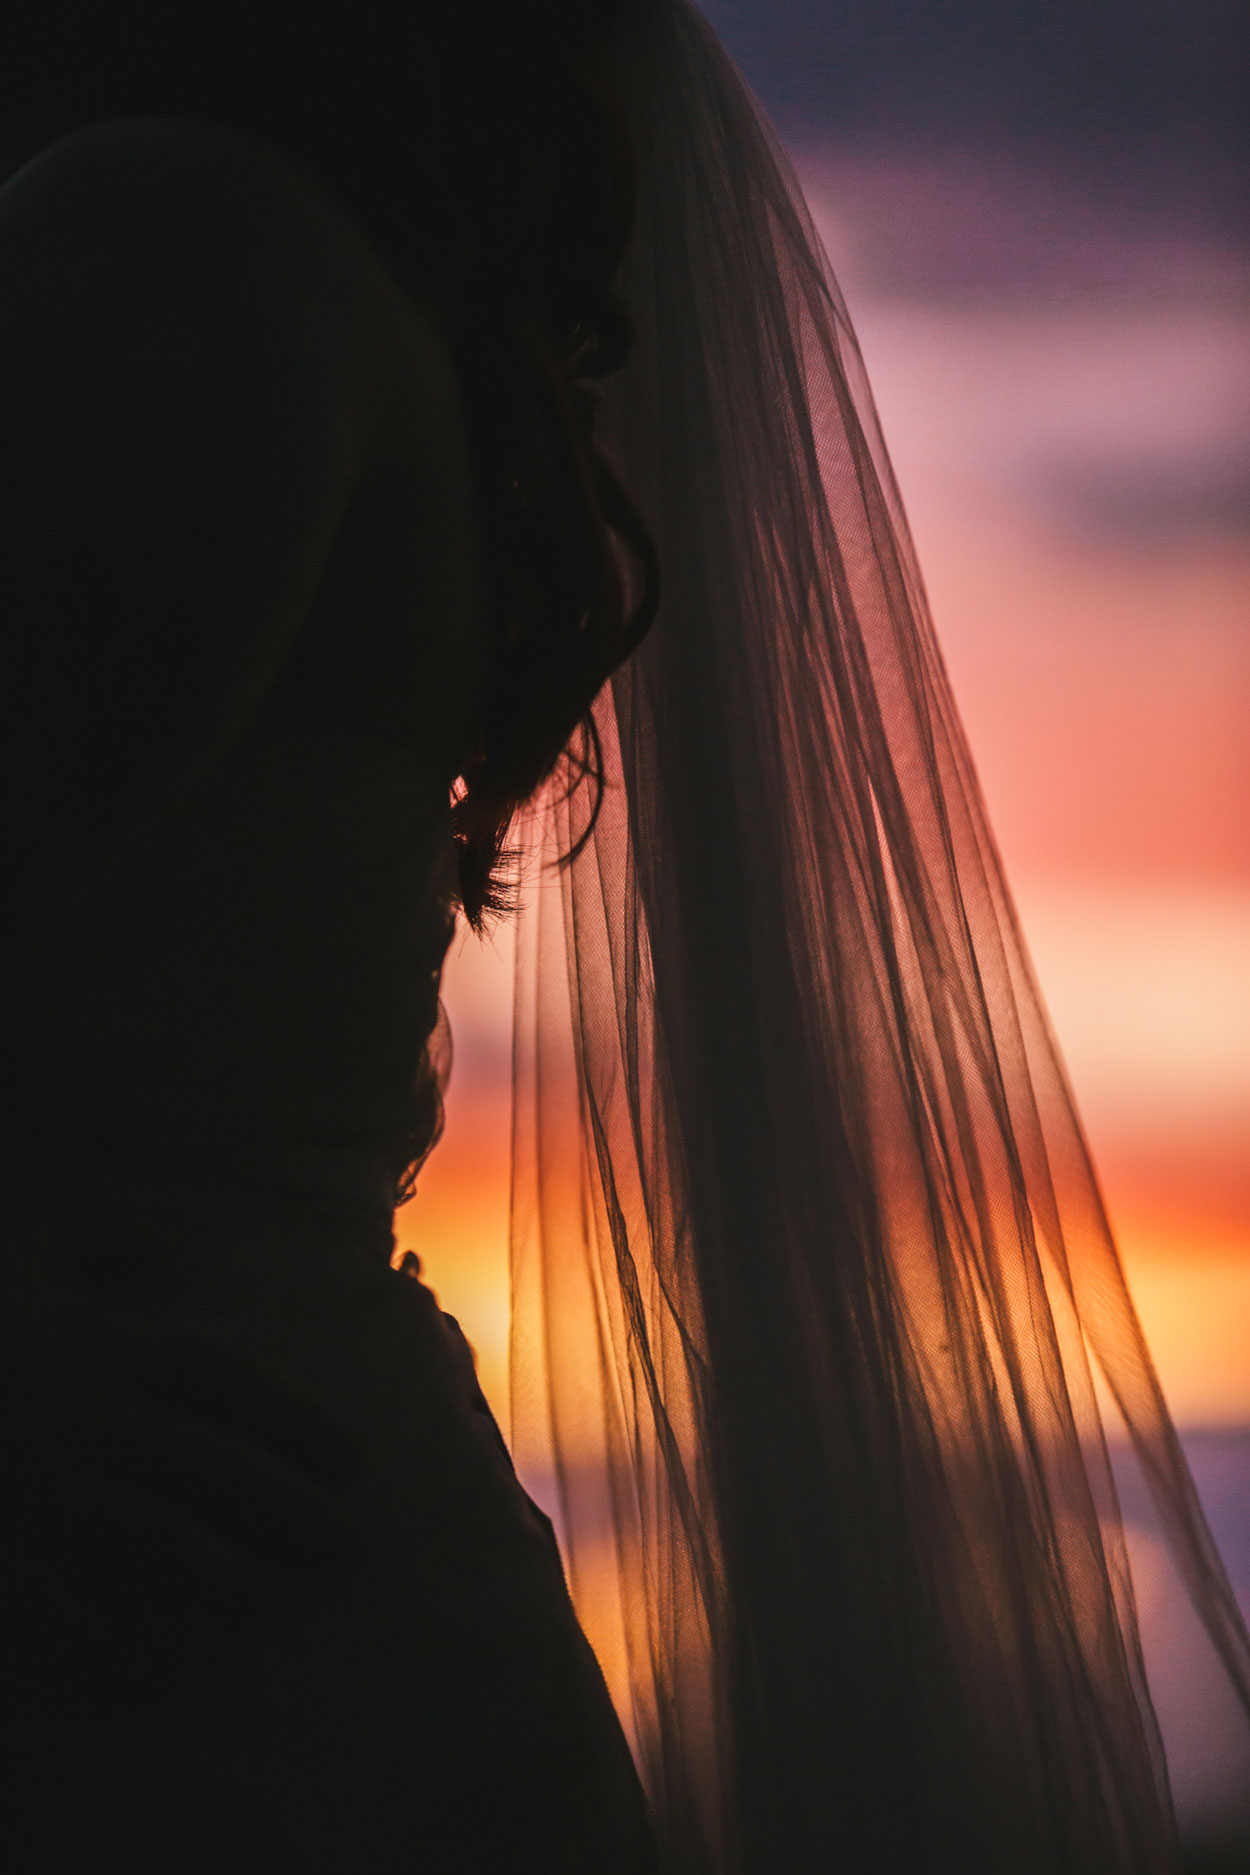 Sunshine-coast-wedding-photographers-noosa-maleny-flaxton-mapleton-montville-hinterland-coolum-mooloolaba-maroochydore-caloundra-beach-elopement-eco-friendly-best-photos-114.jpg